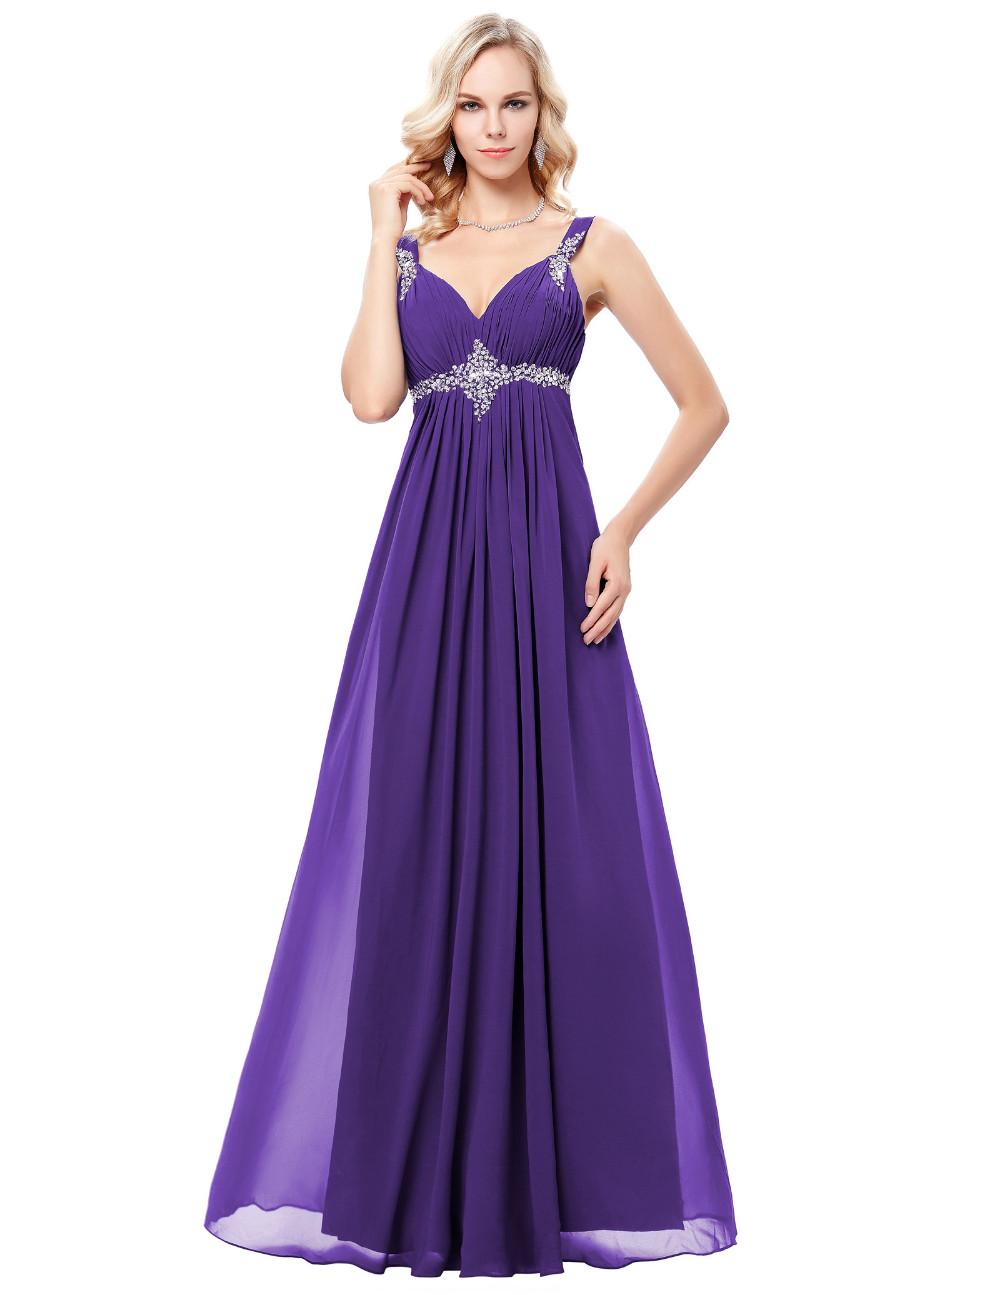 HTB1mSQxOFXXXXaQXXXXq6xXFXXXsLong Formal Dress Elegant Floor Length Chiffon Dress